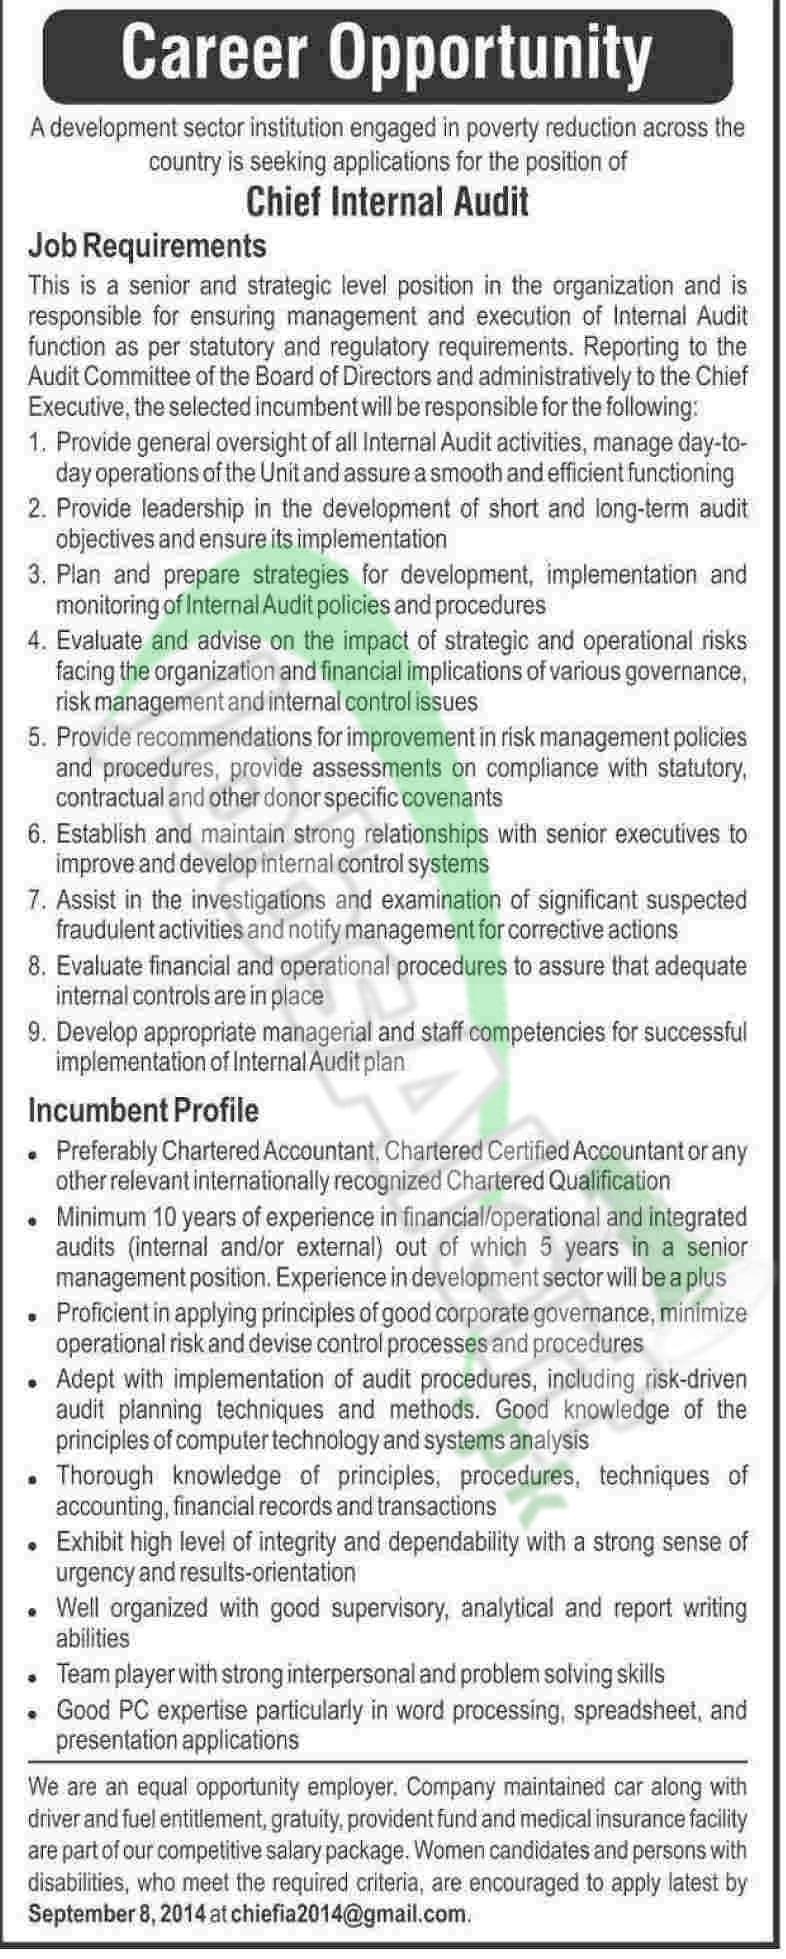 Development Sector Institution